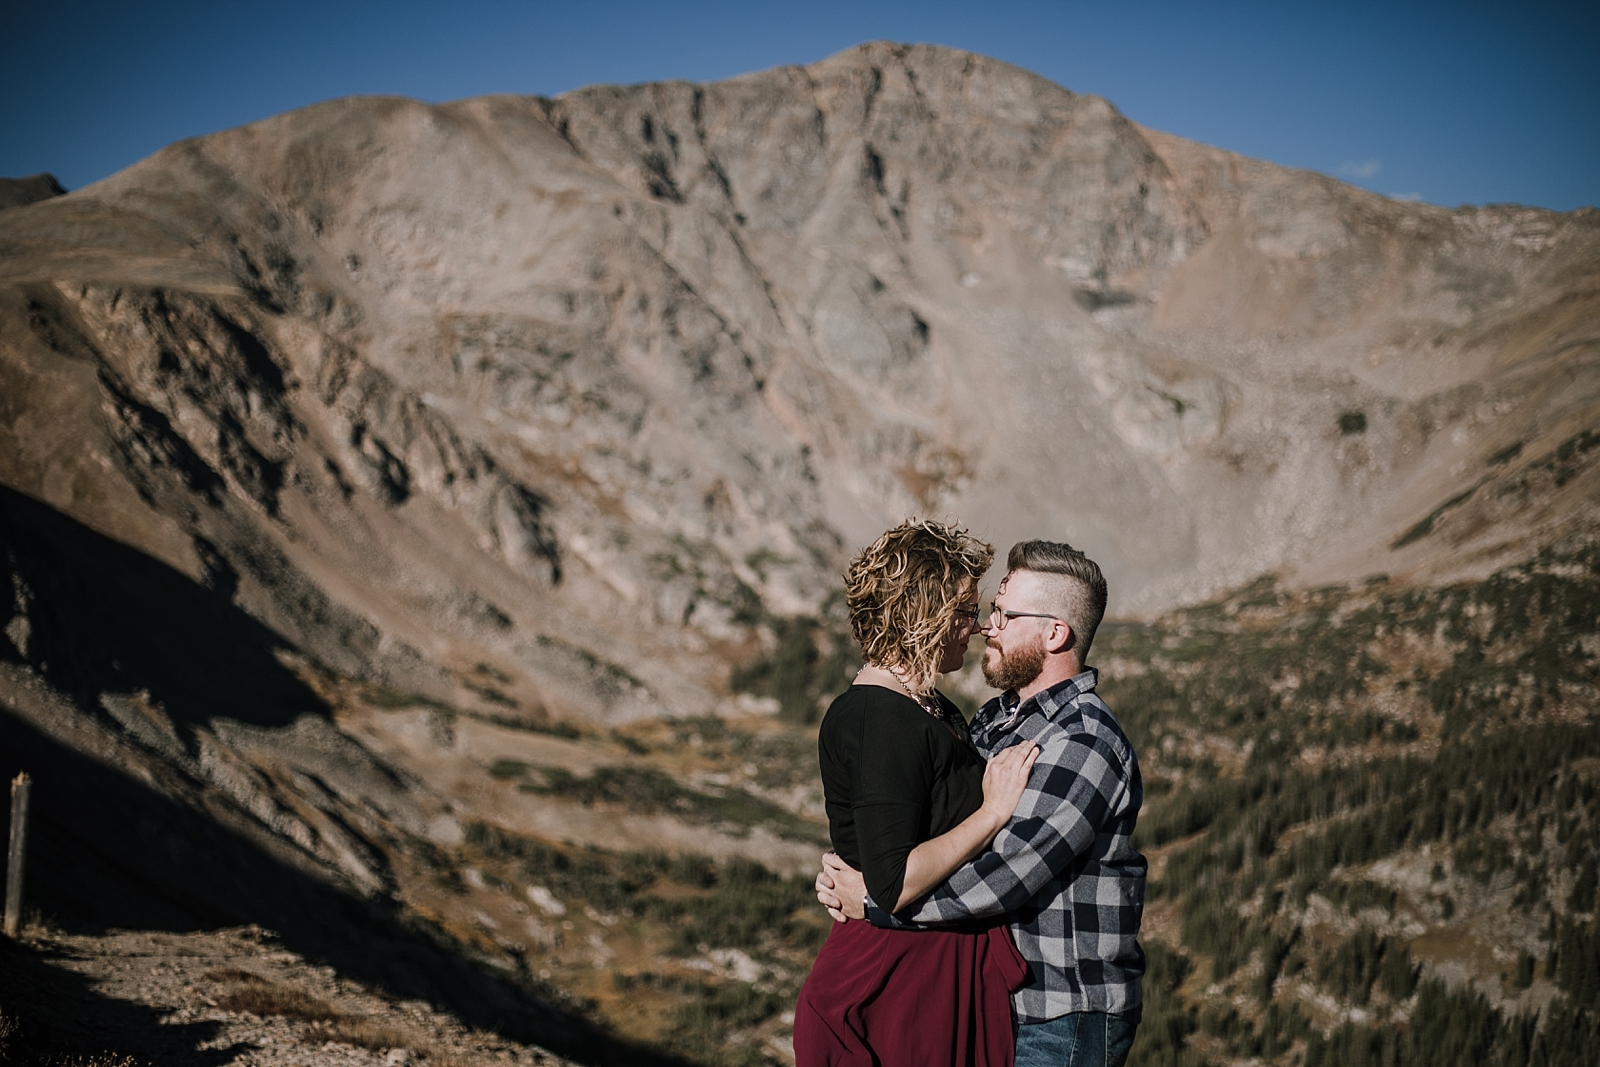 couple kissing, colorado 13er, hike little echo lake, backpacking james peak wilderness, hike james peak lake, james peak elopement, winter park elopement, backpacking winter park